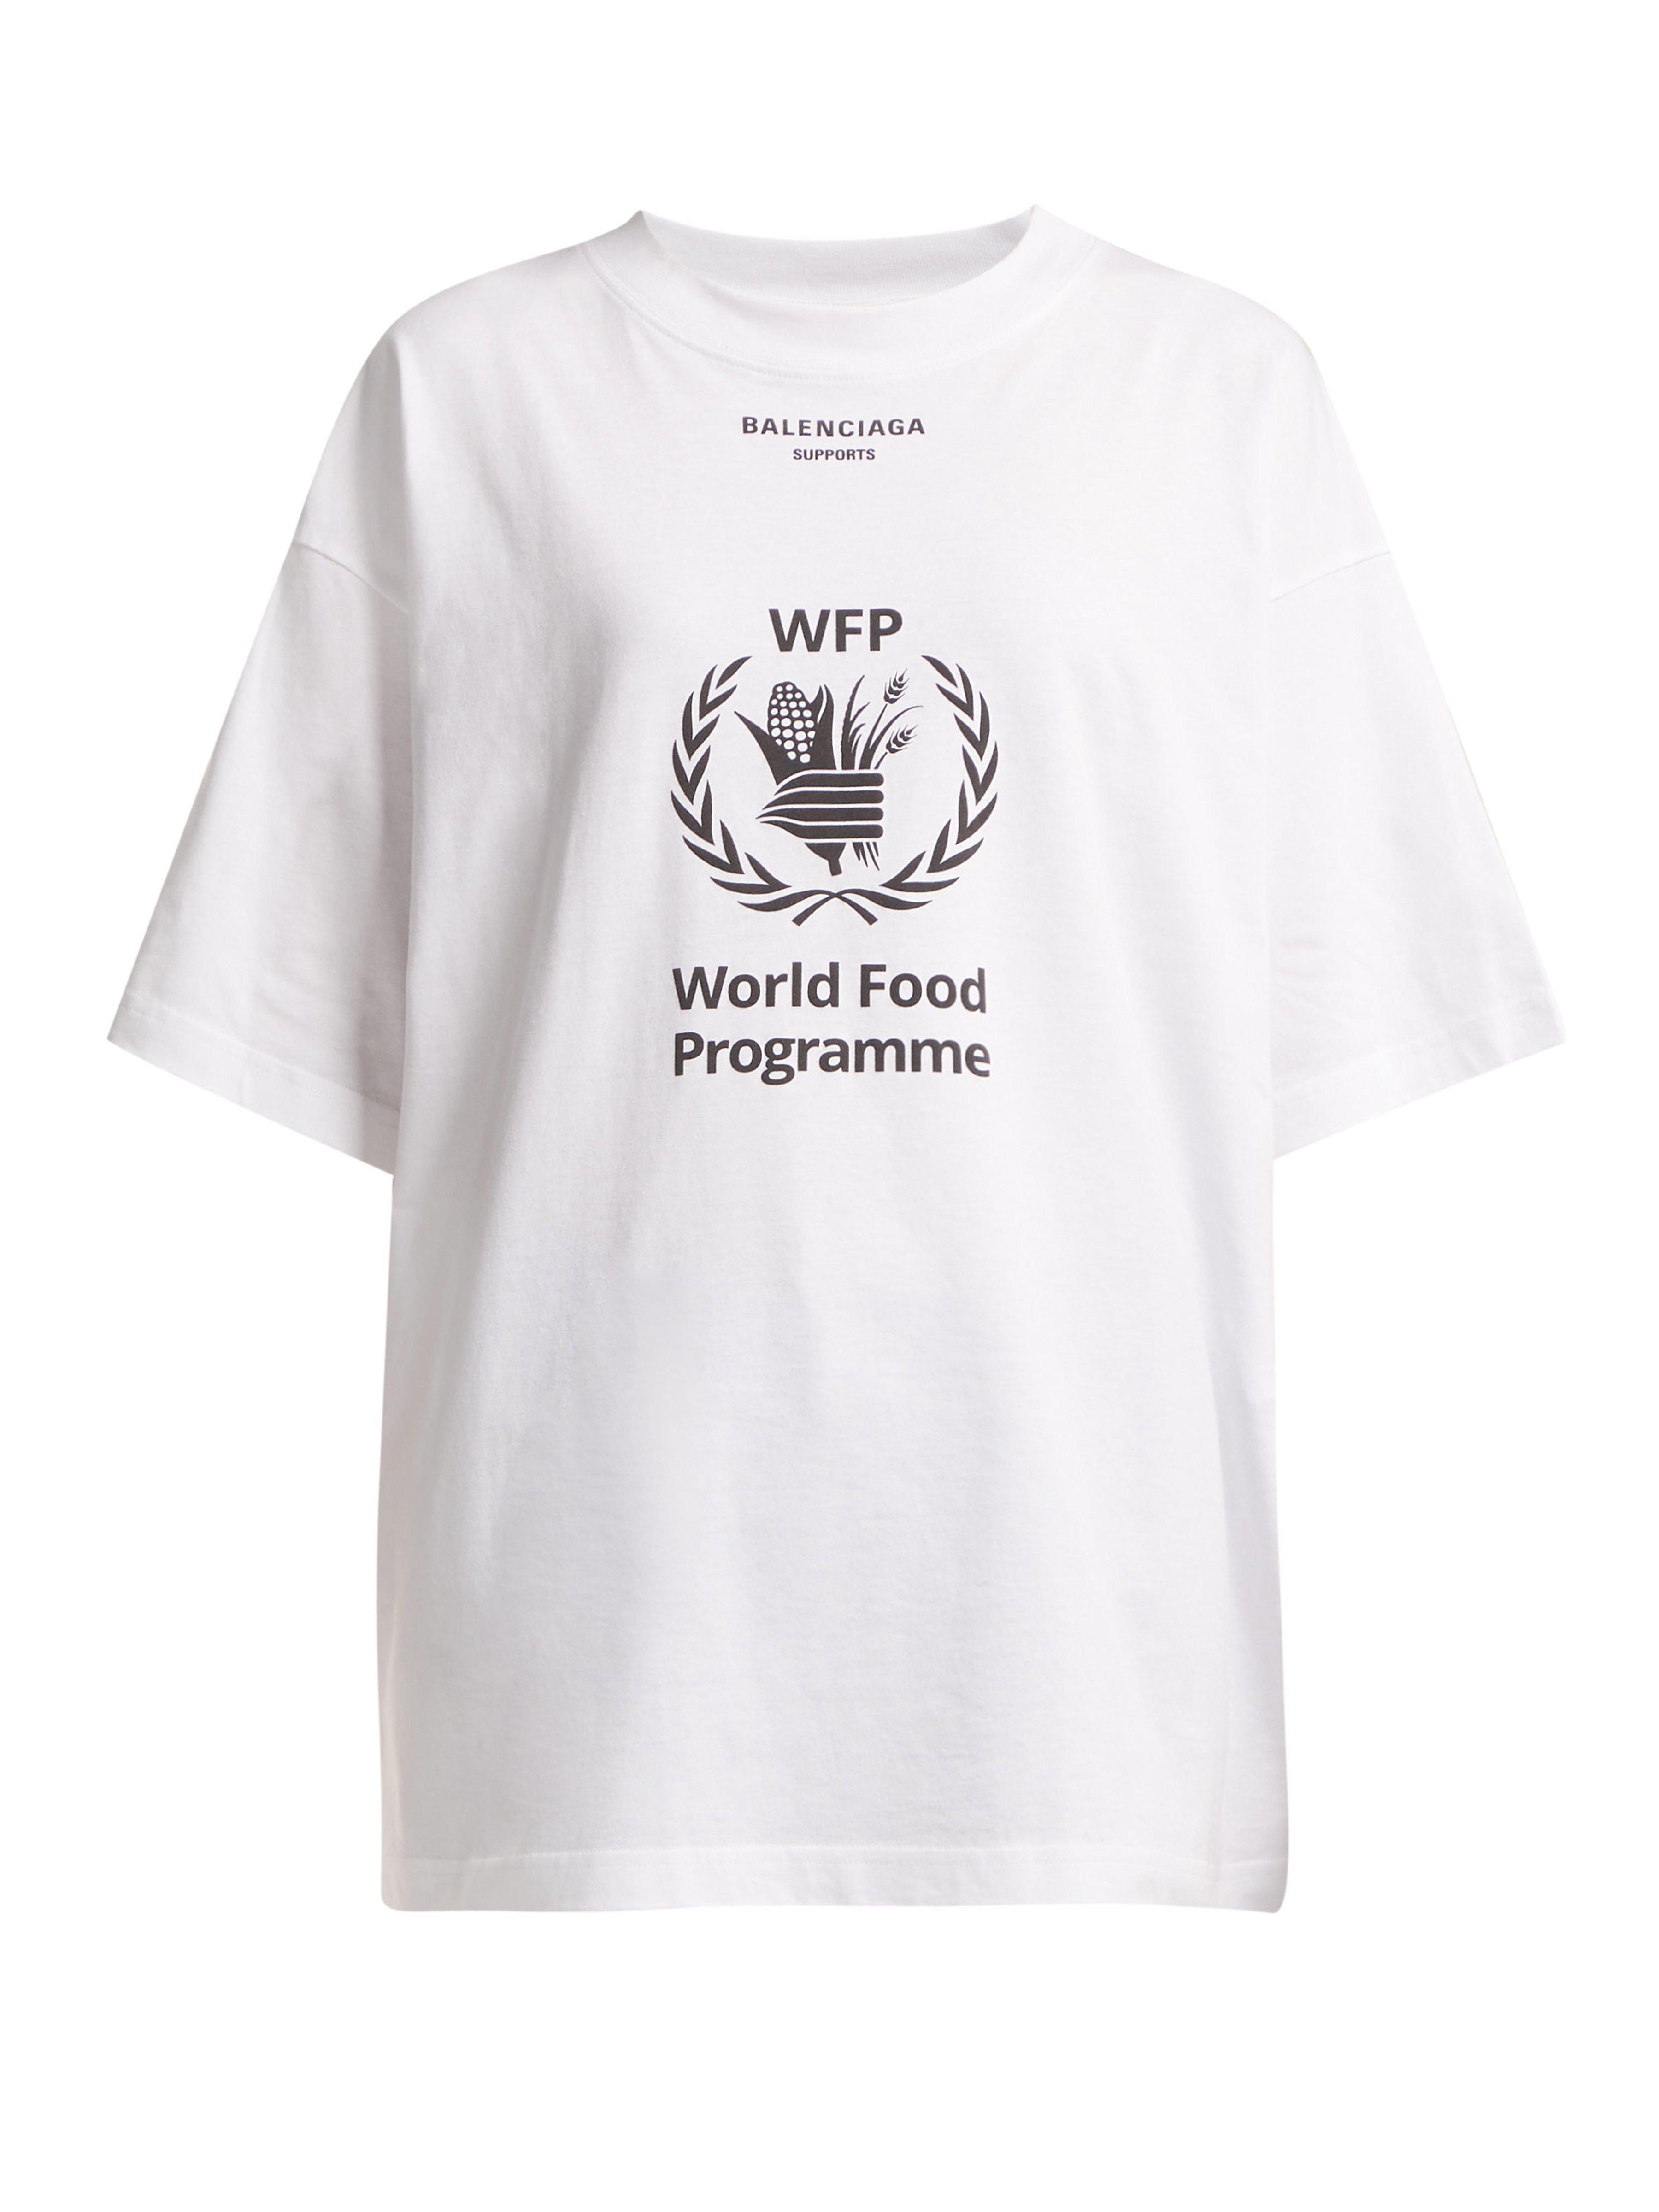 86f19c5438e2e3 Balenciaga Logo Print Cotton Jersey T Shirt in White - Lyst